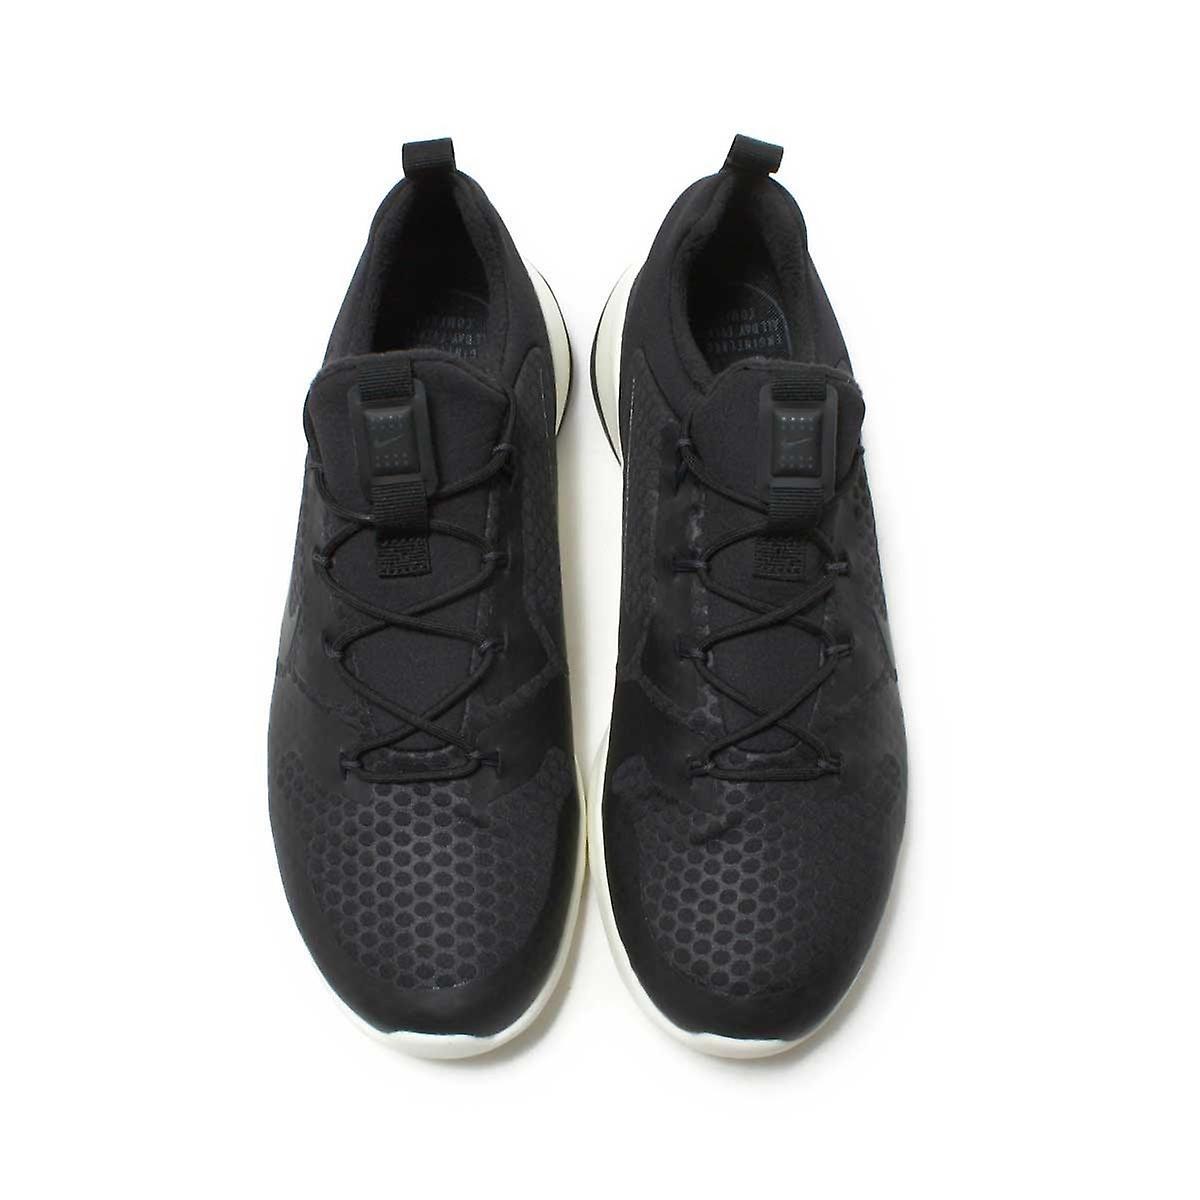 Nike CK Racer 916780 005 Mens utbildare